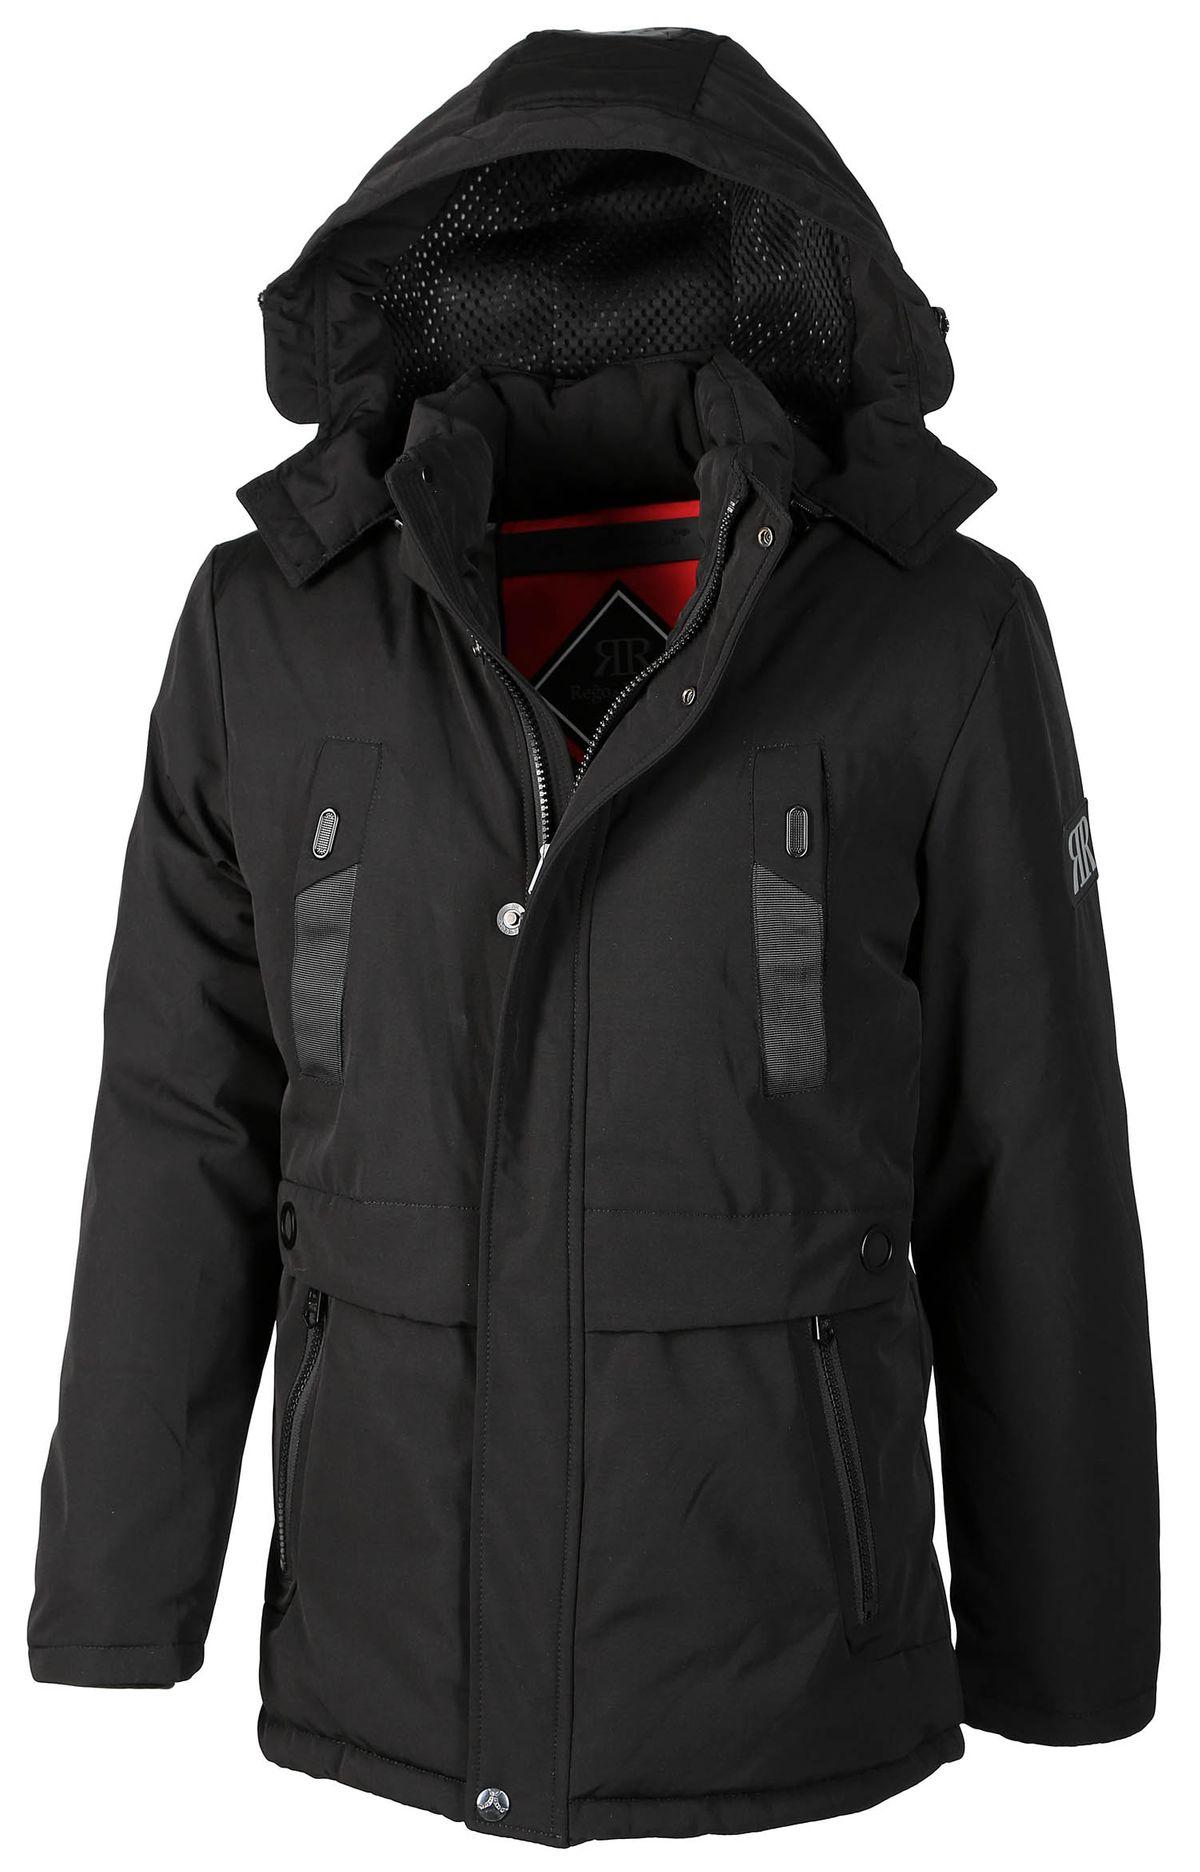 Hooded Show Mens Parka Richard Details Warm Regino Original Title Regoamp; Winter Jacket Coat About Lined qS4ARjc35L